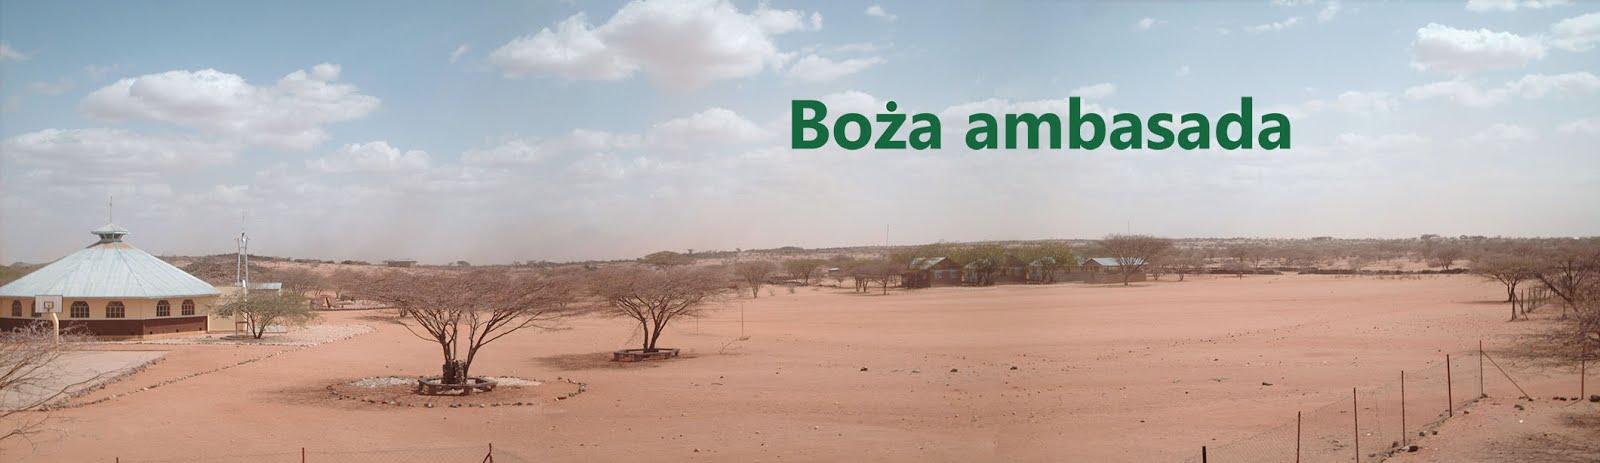 Boża ambasada w Zambii